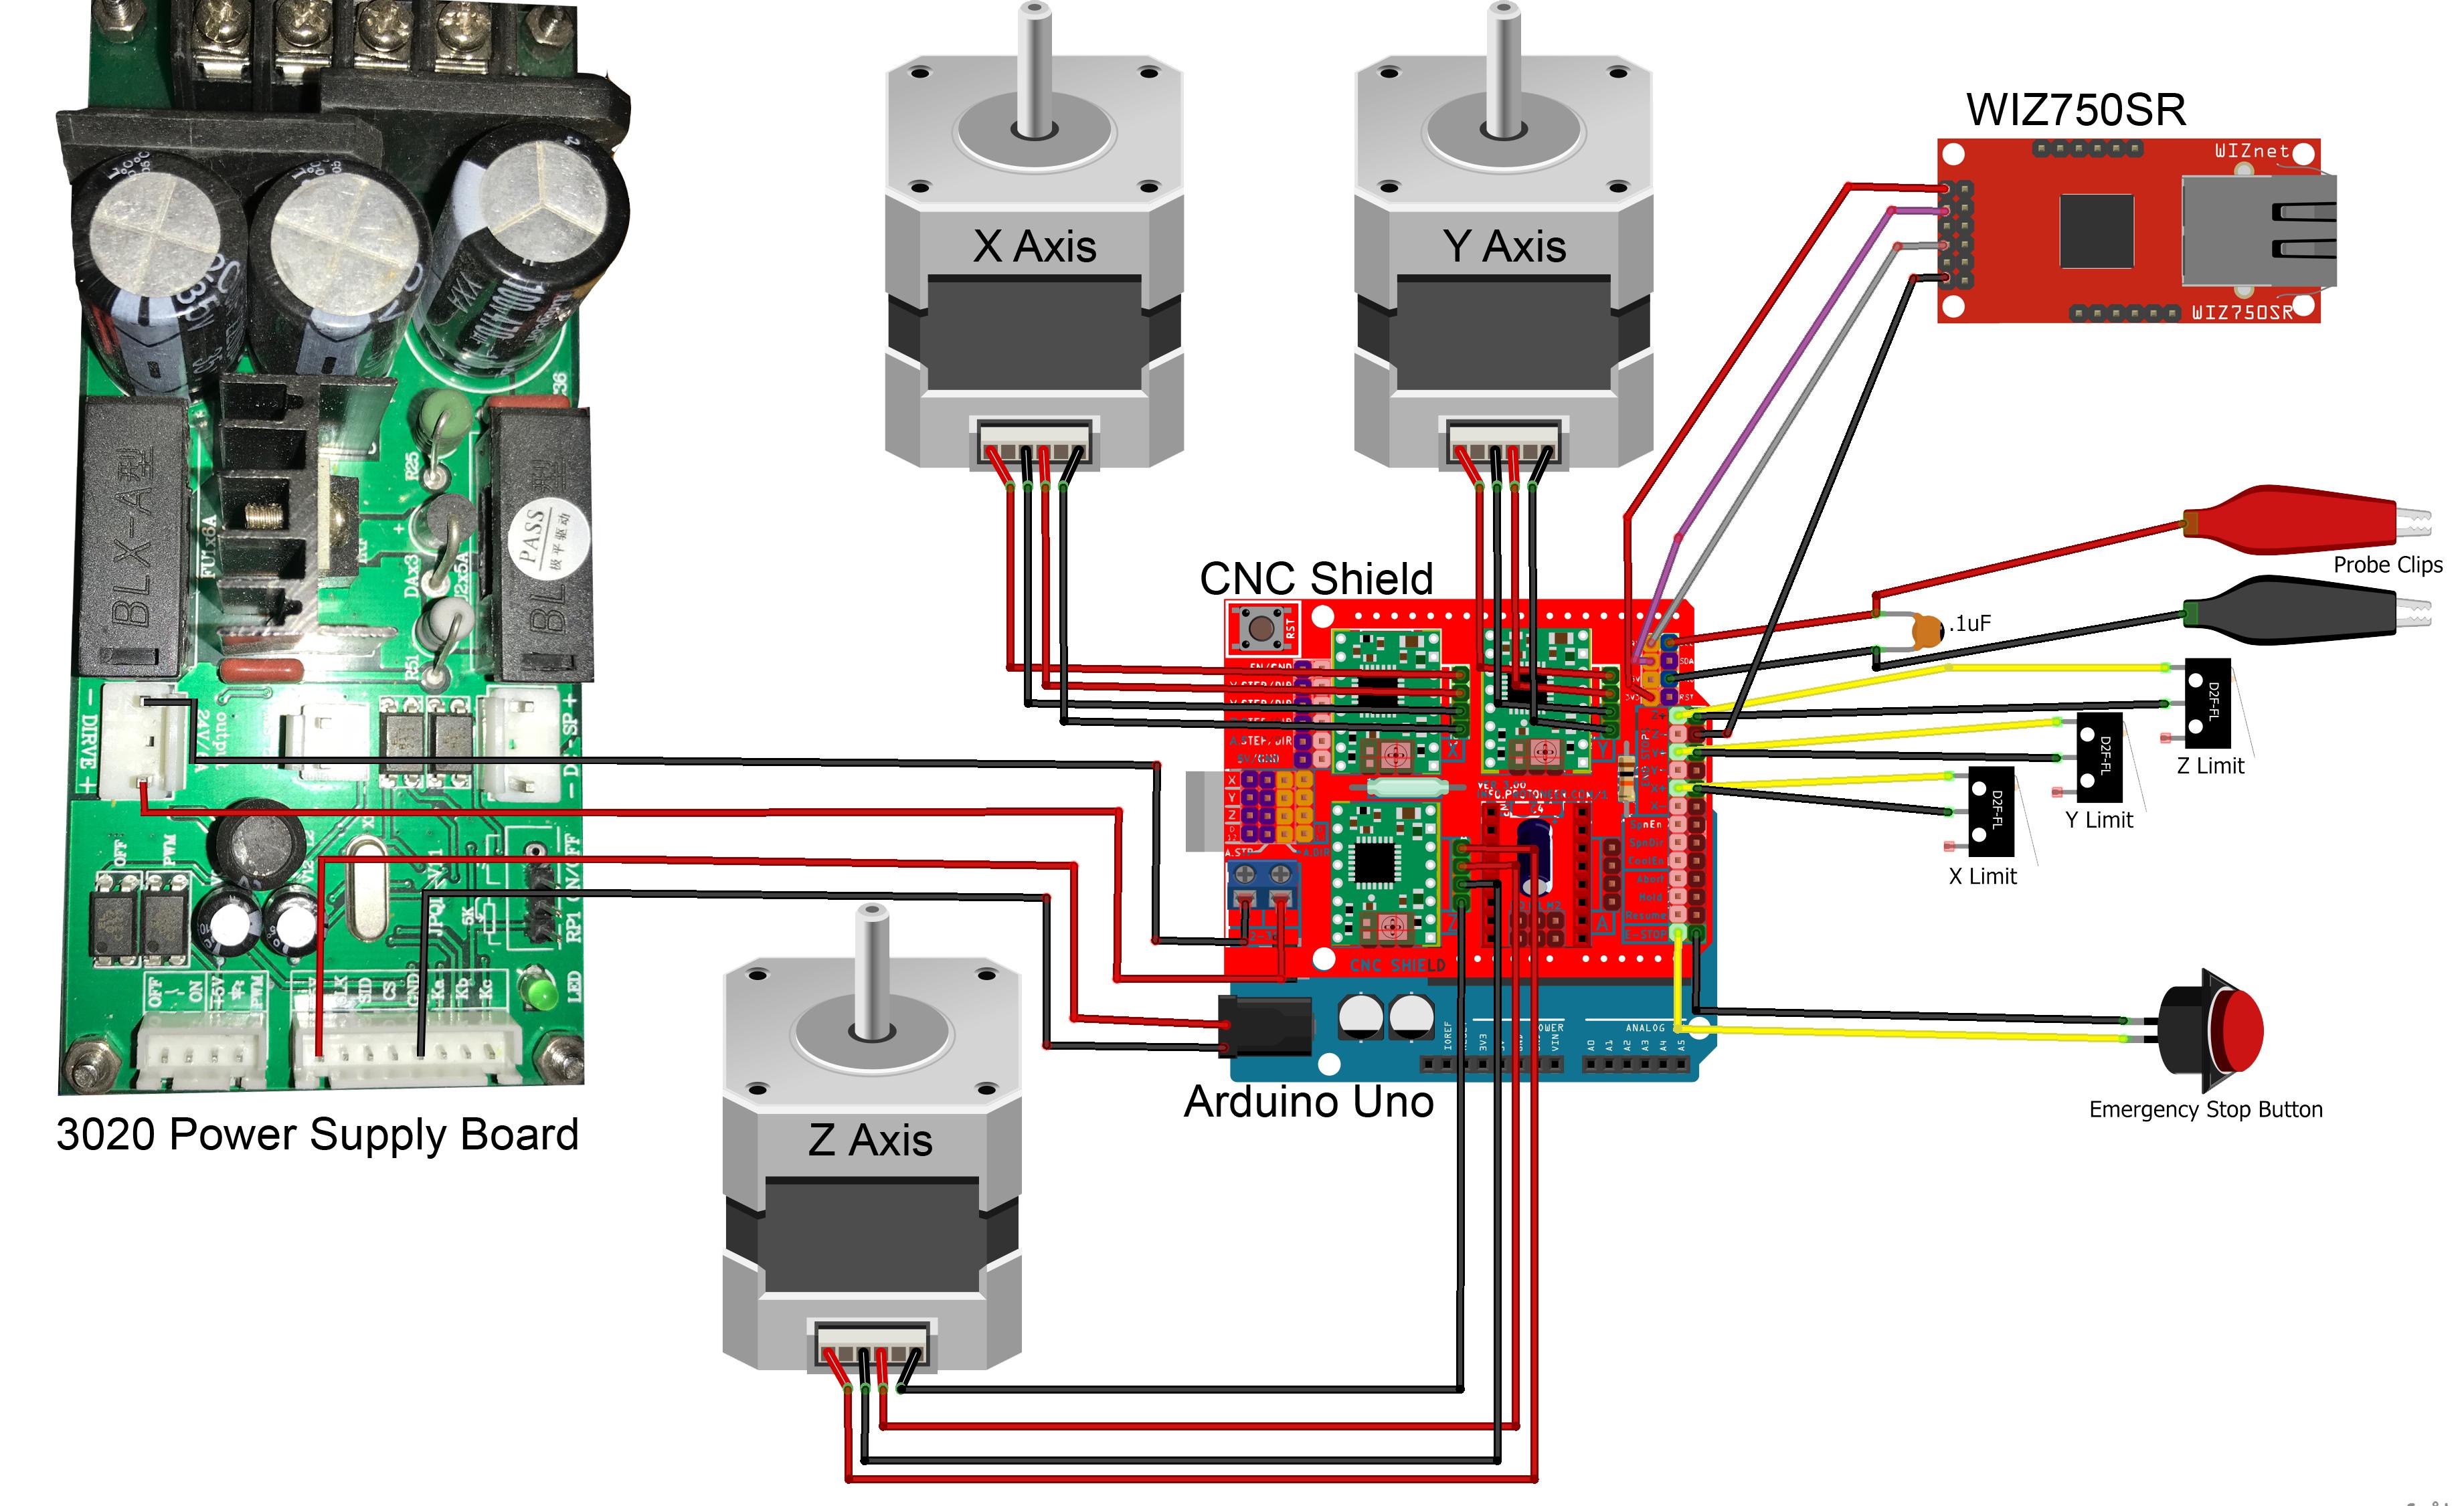 Pleasing Arduino Cnc Shield Wiring Diagram Wiring Diagram Database Wiring Cloud Hisonuggs Outletorg